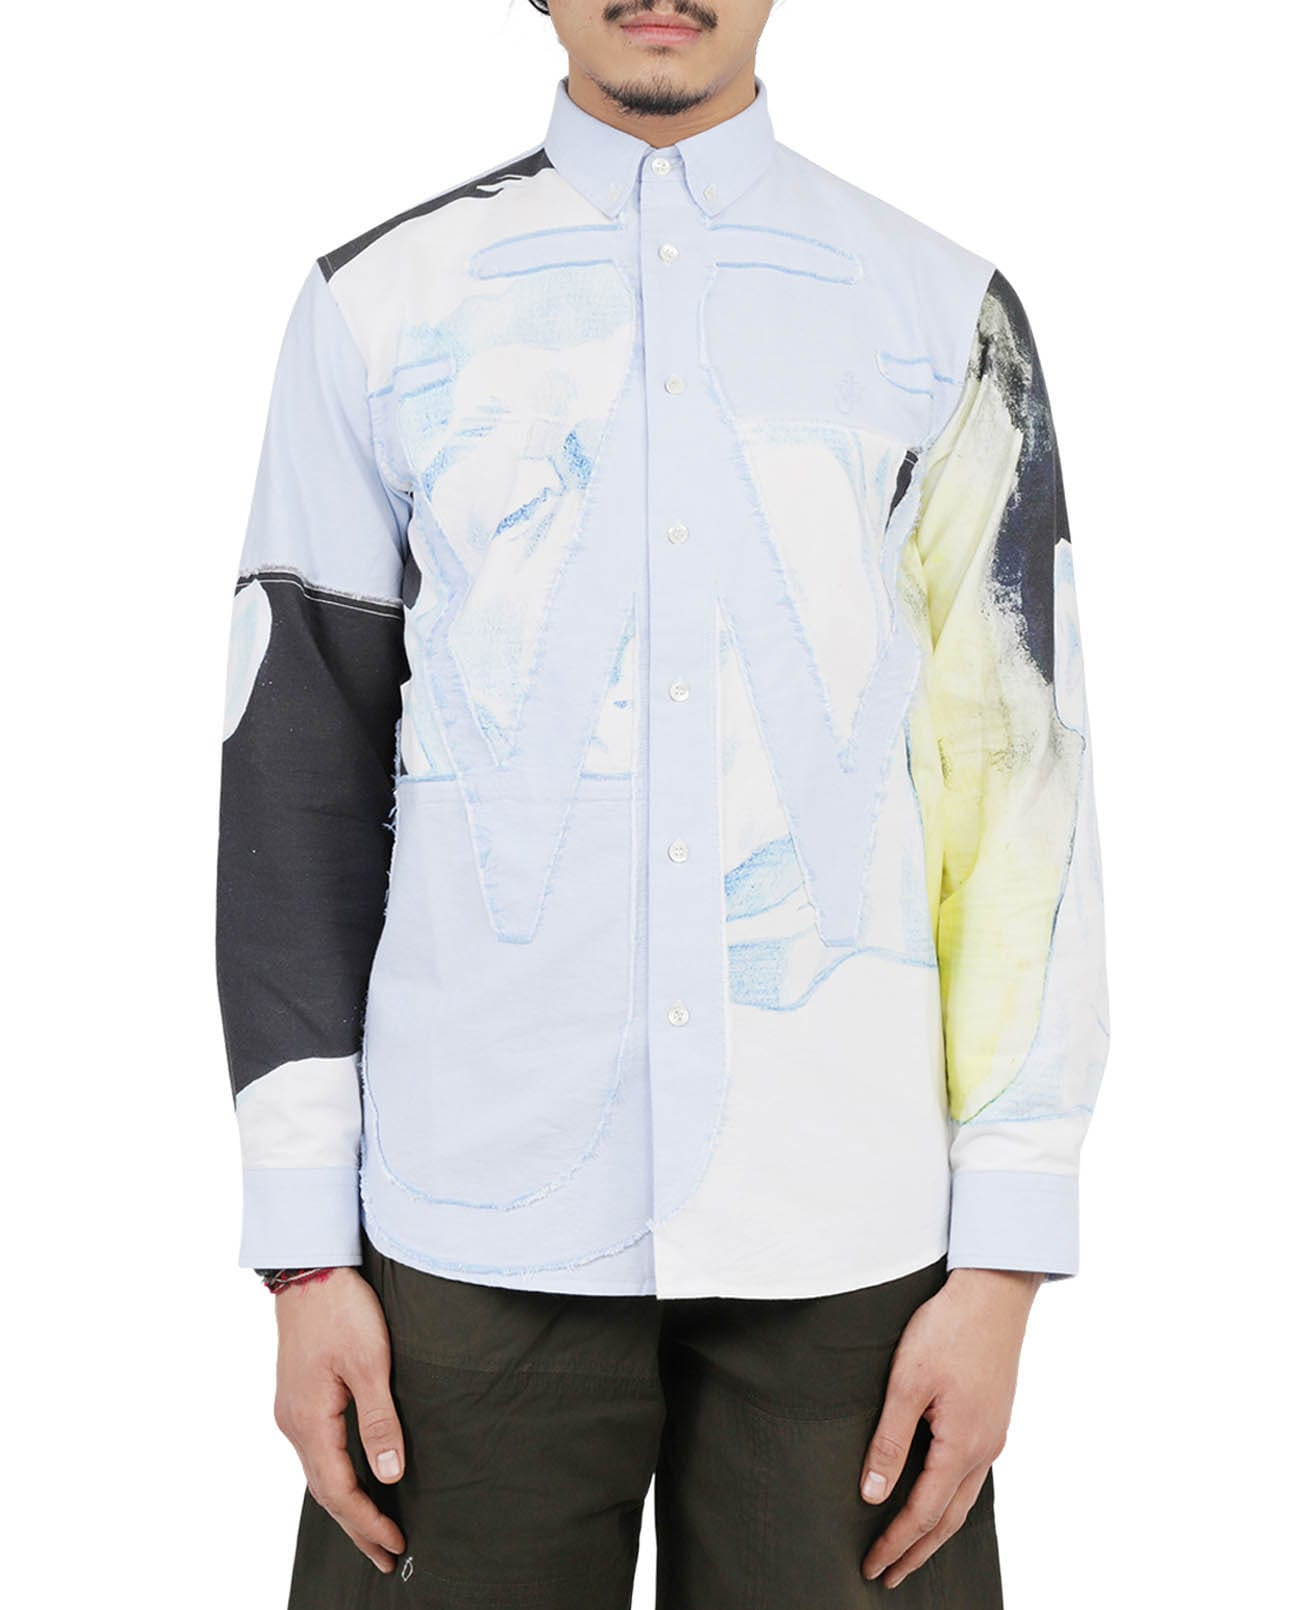 Jw Anderson Shirts JW ANDERSON PRINTED ANCHOR SHIRT